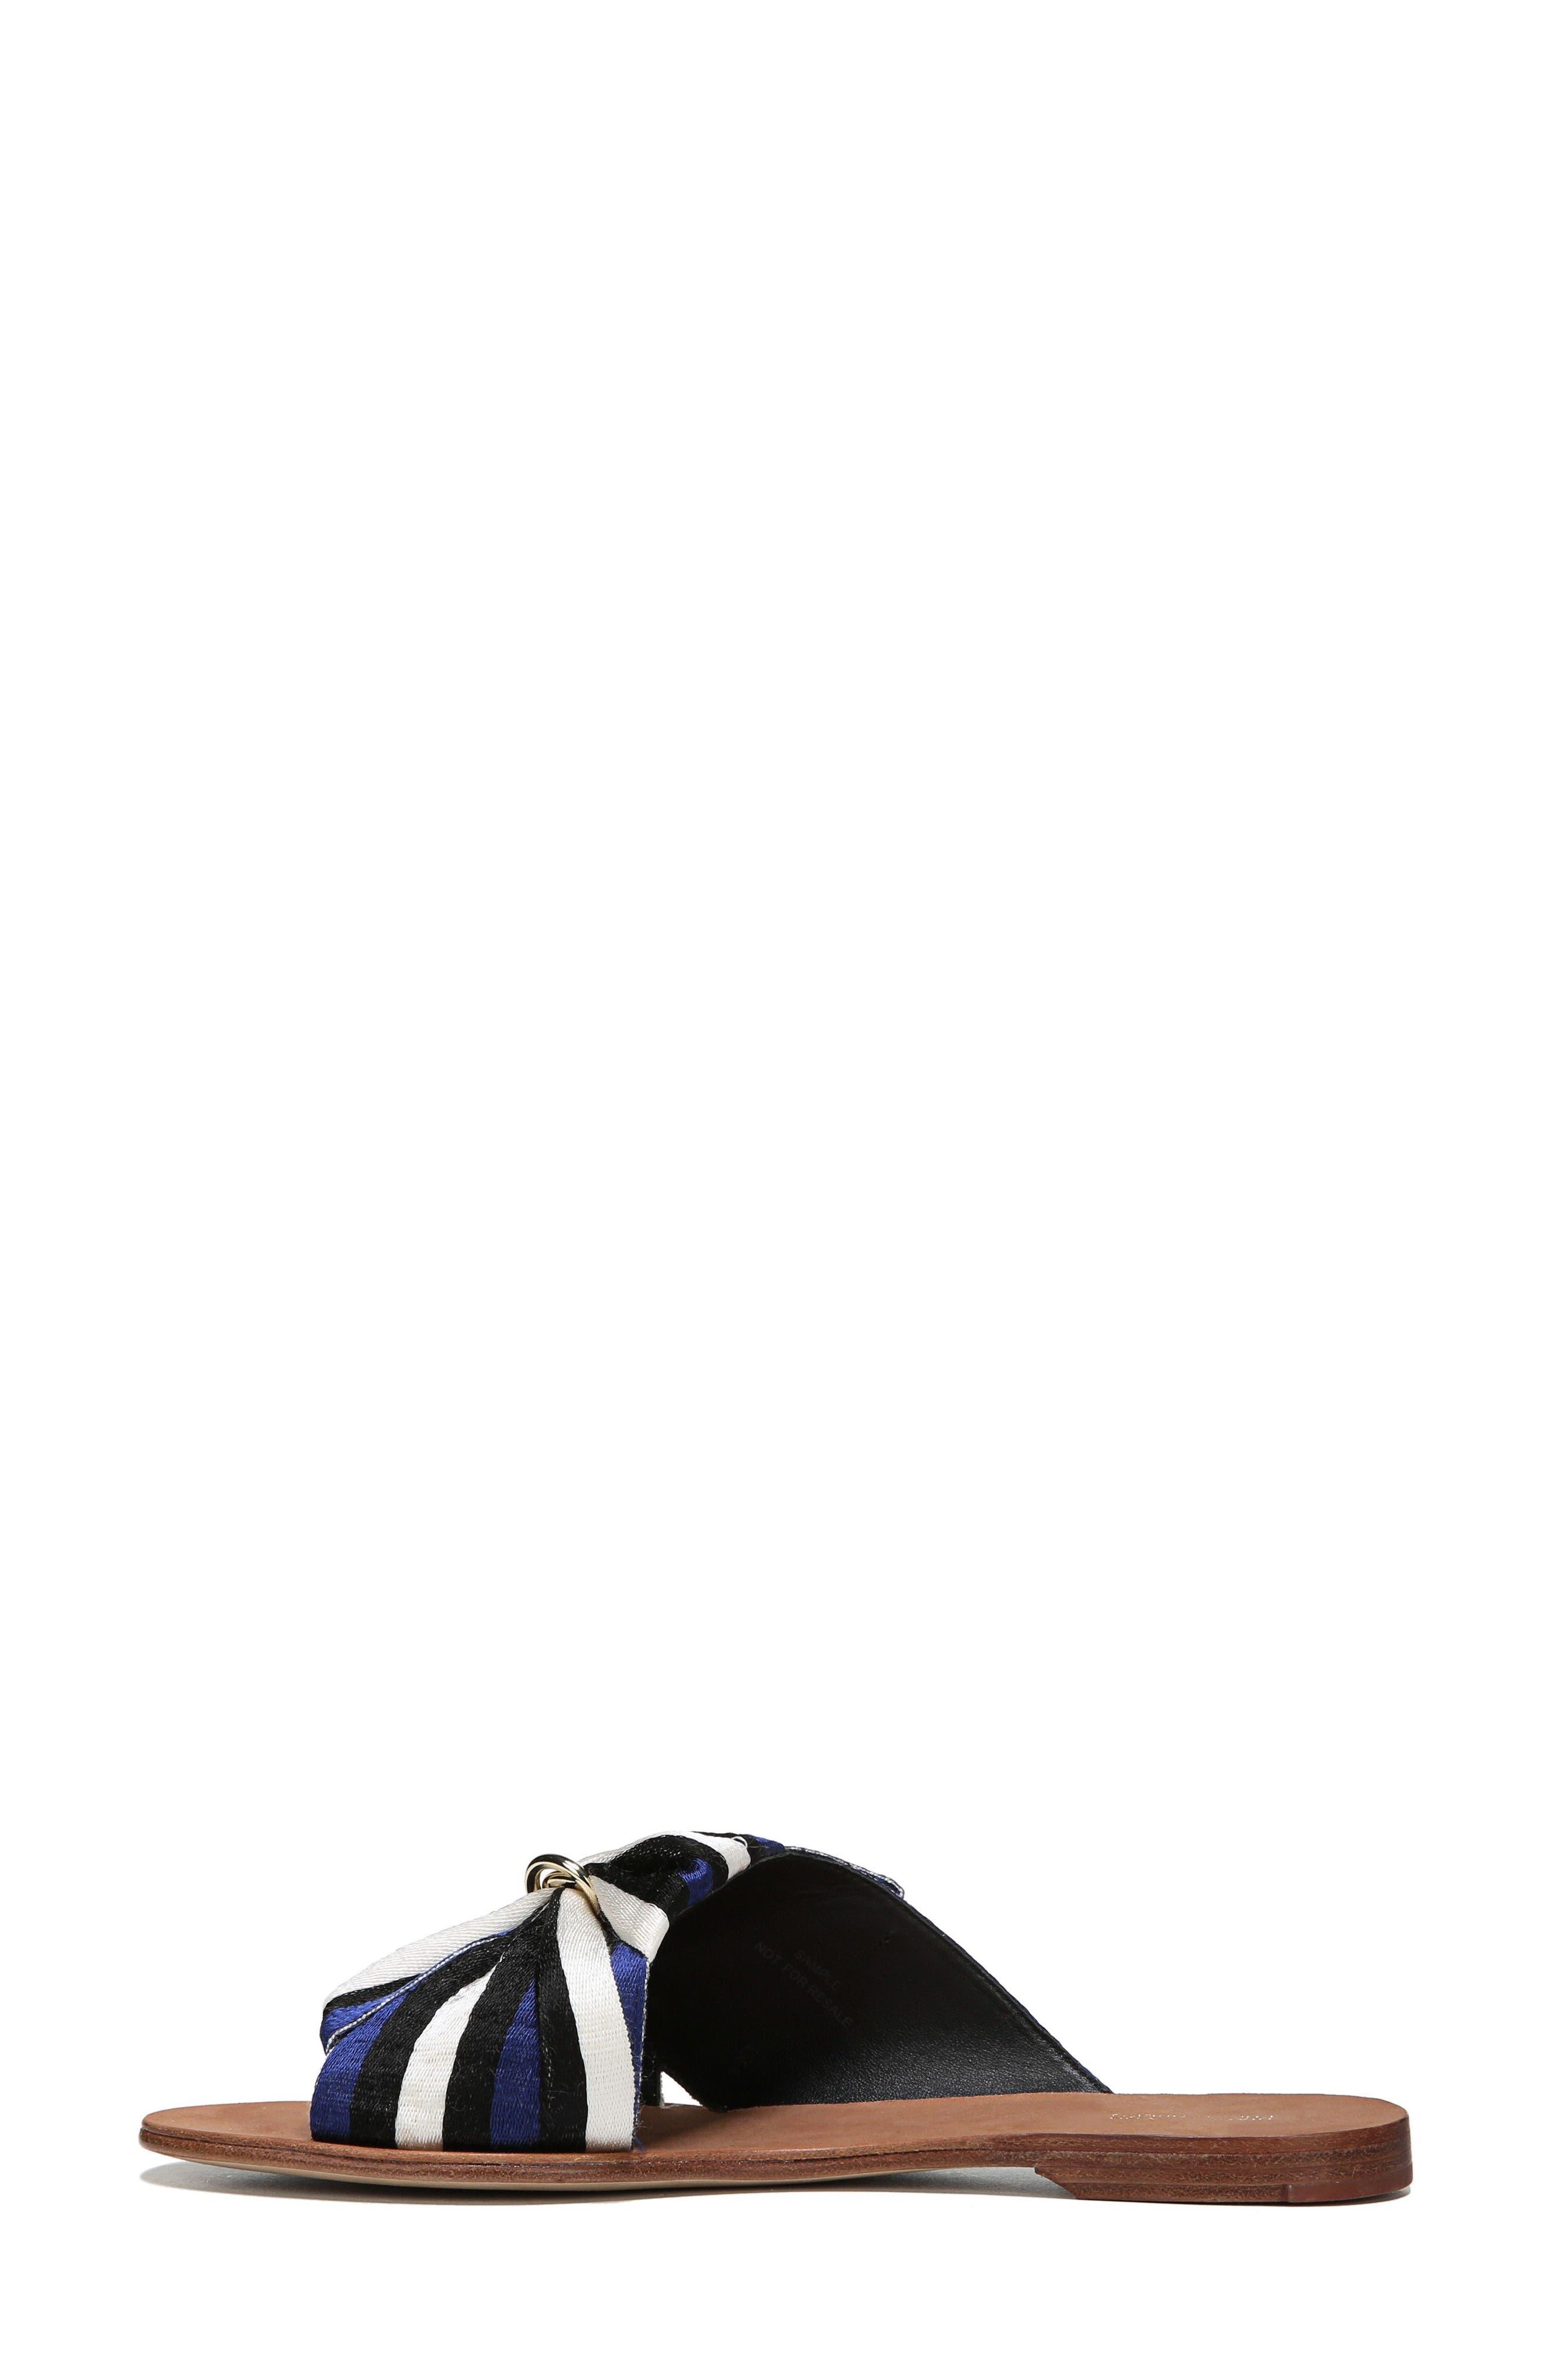 Bella Asymmetrical Slide Sandal,                             Alternate thumbnail 3, color,                             400